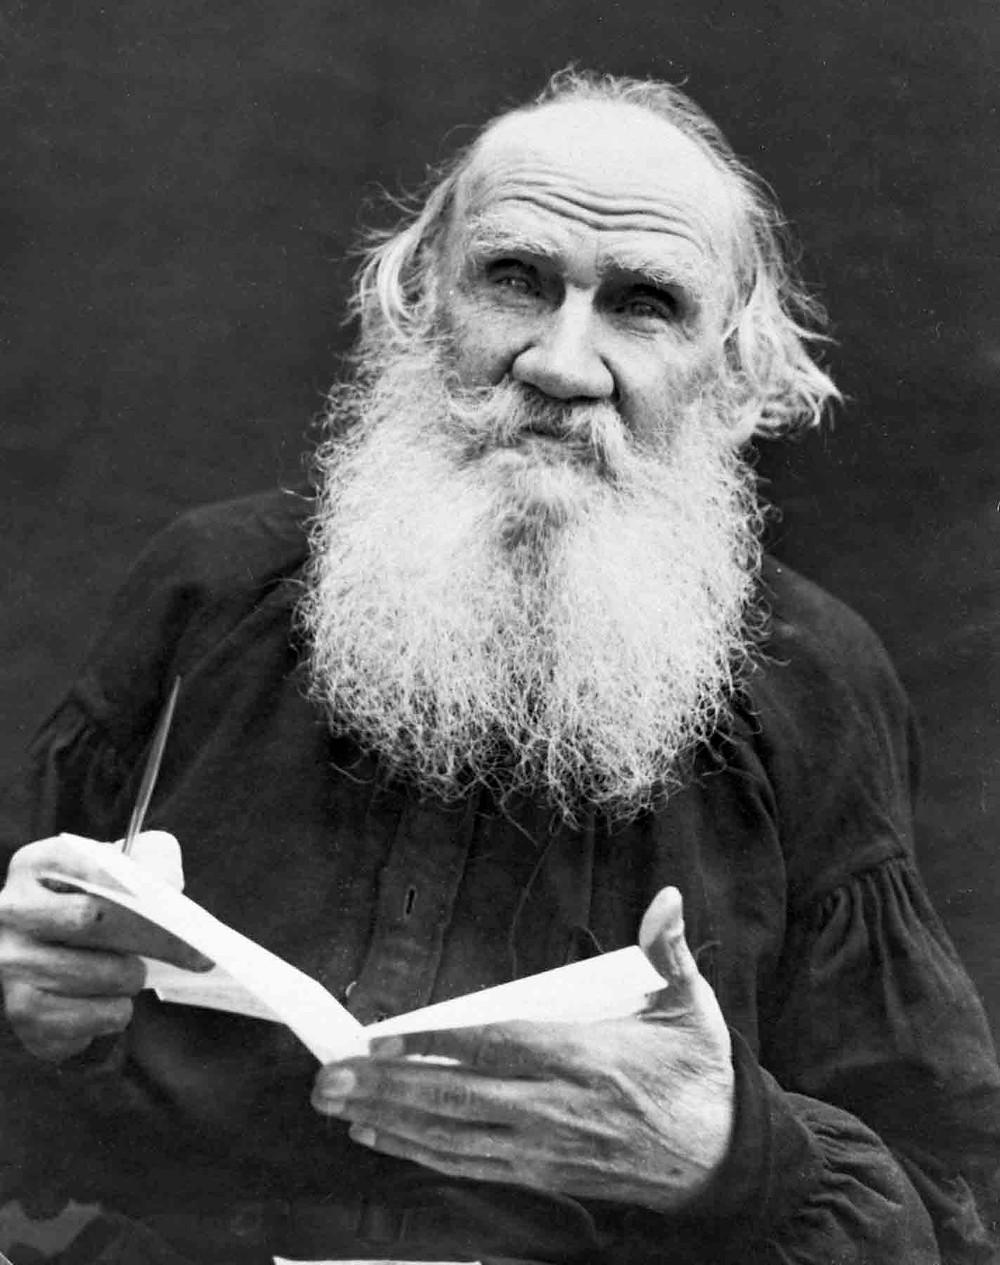 Russian Writer Leo Tolstoy